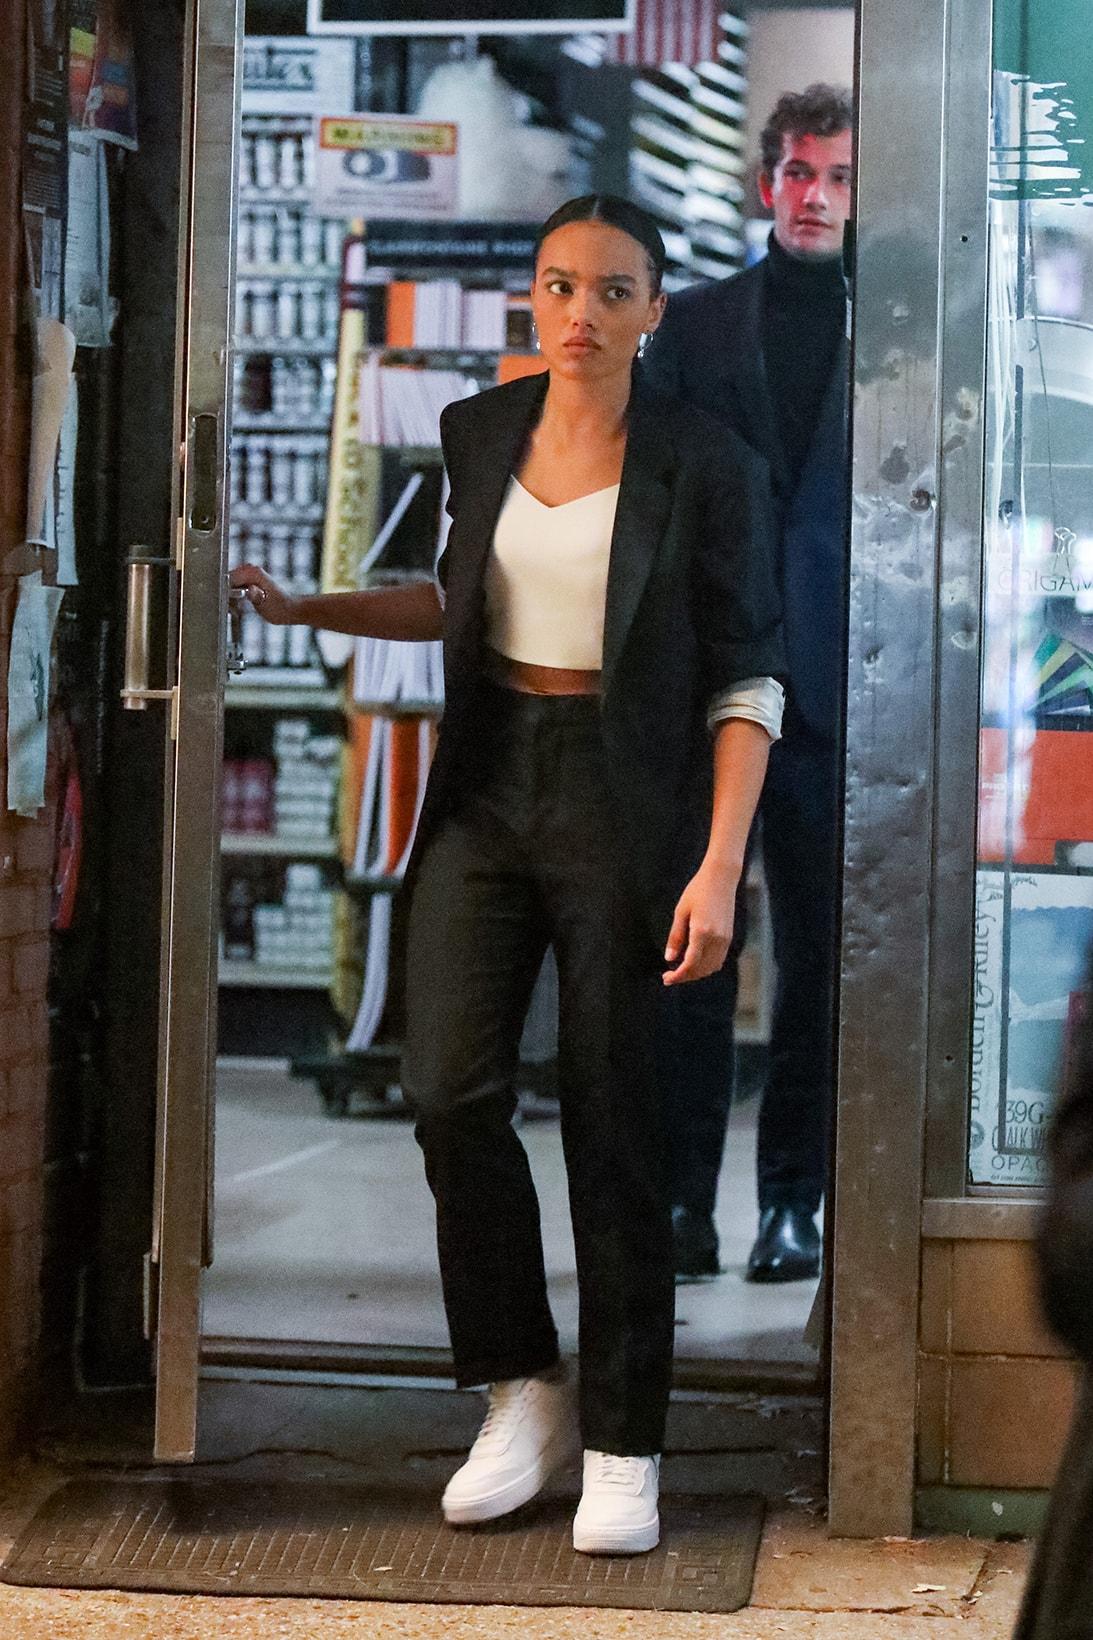 Gossip Girl Reboot HBO Max 2021 Whitney Peak Zoya Lott Julien Calloway Jordan Alexander Luna La Zión Moreno Monet de Haan Savannah Smith Costumes Outfits Fashion Style